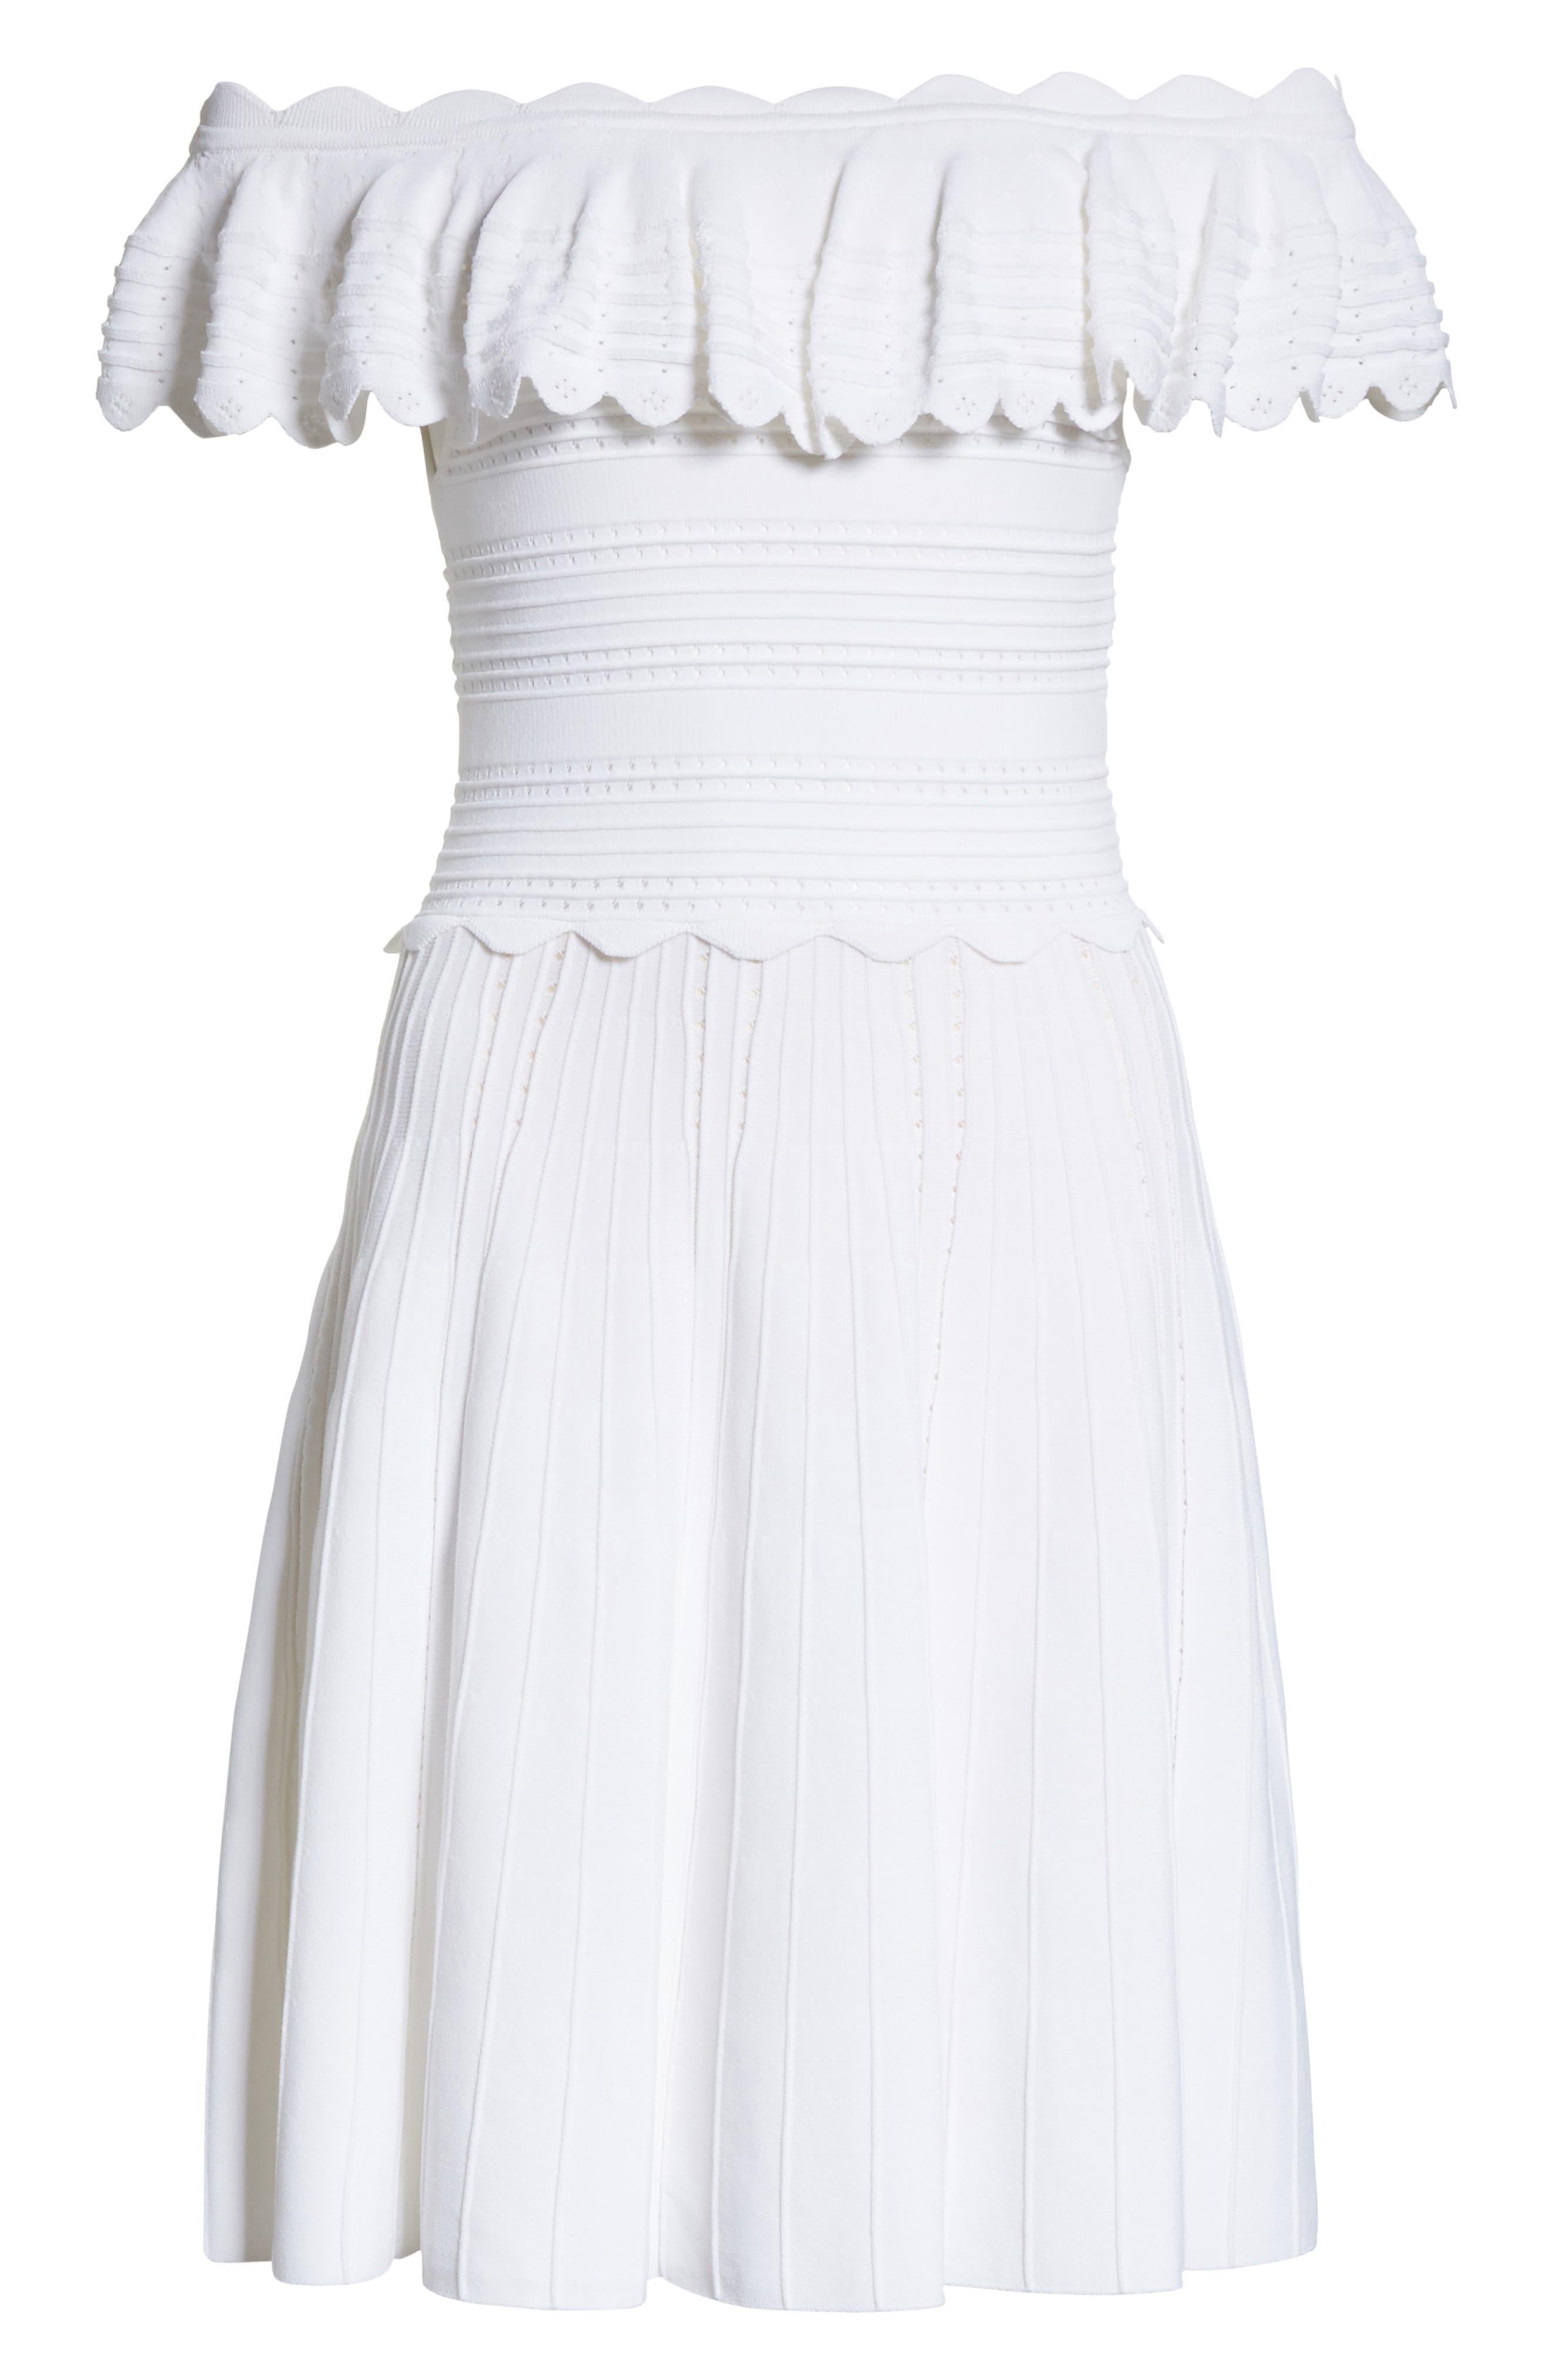 Janella Ruffled Off the Shoulder Dress,                             Alternate thumbnail 6, color,                             Optic White